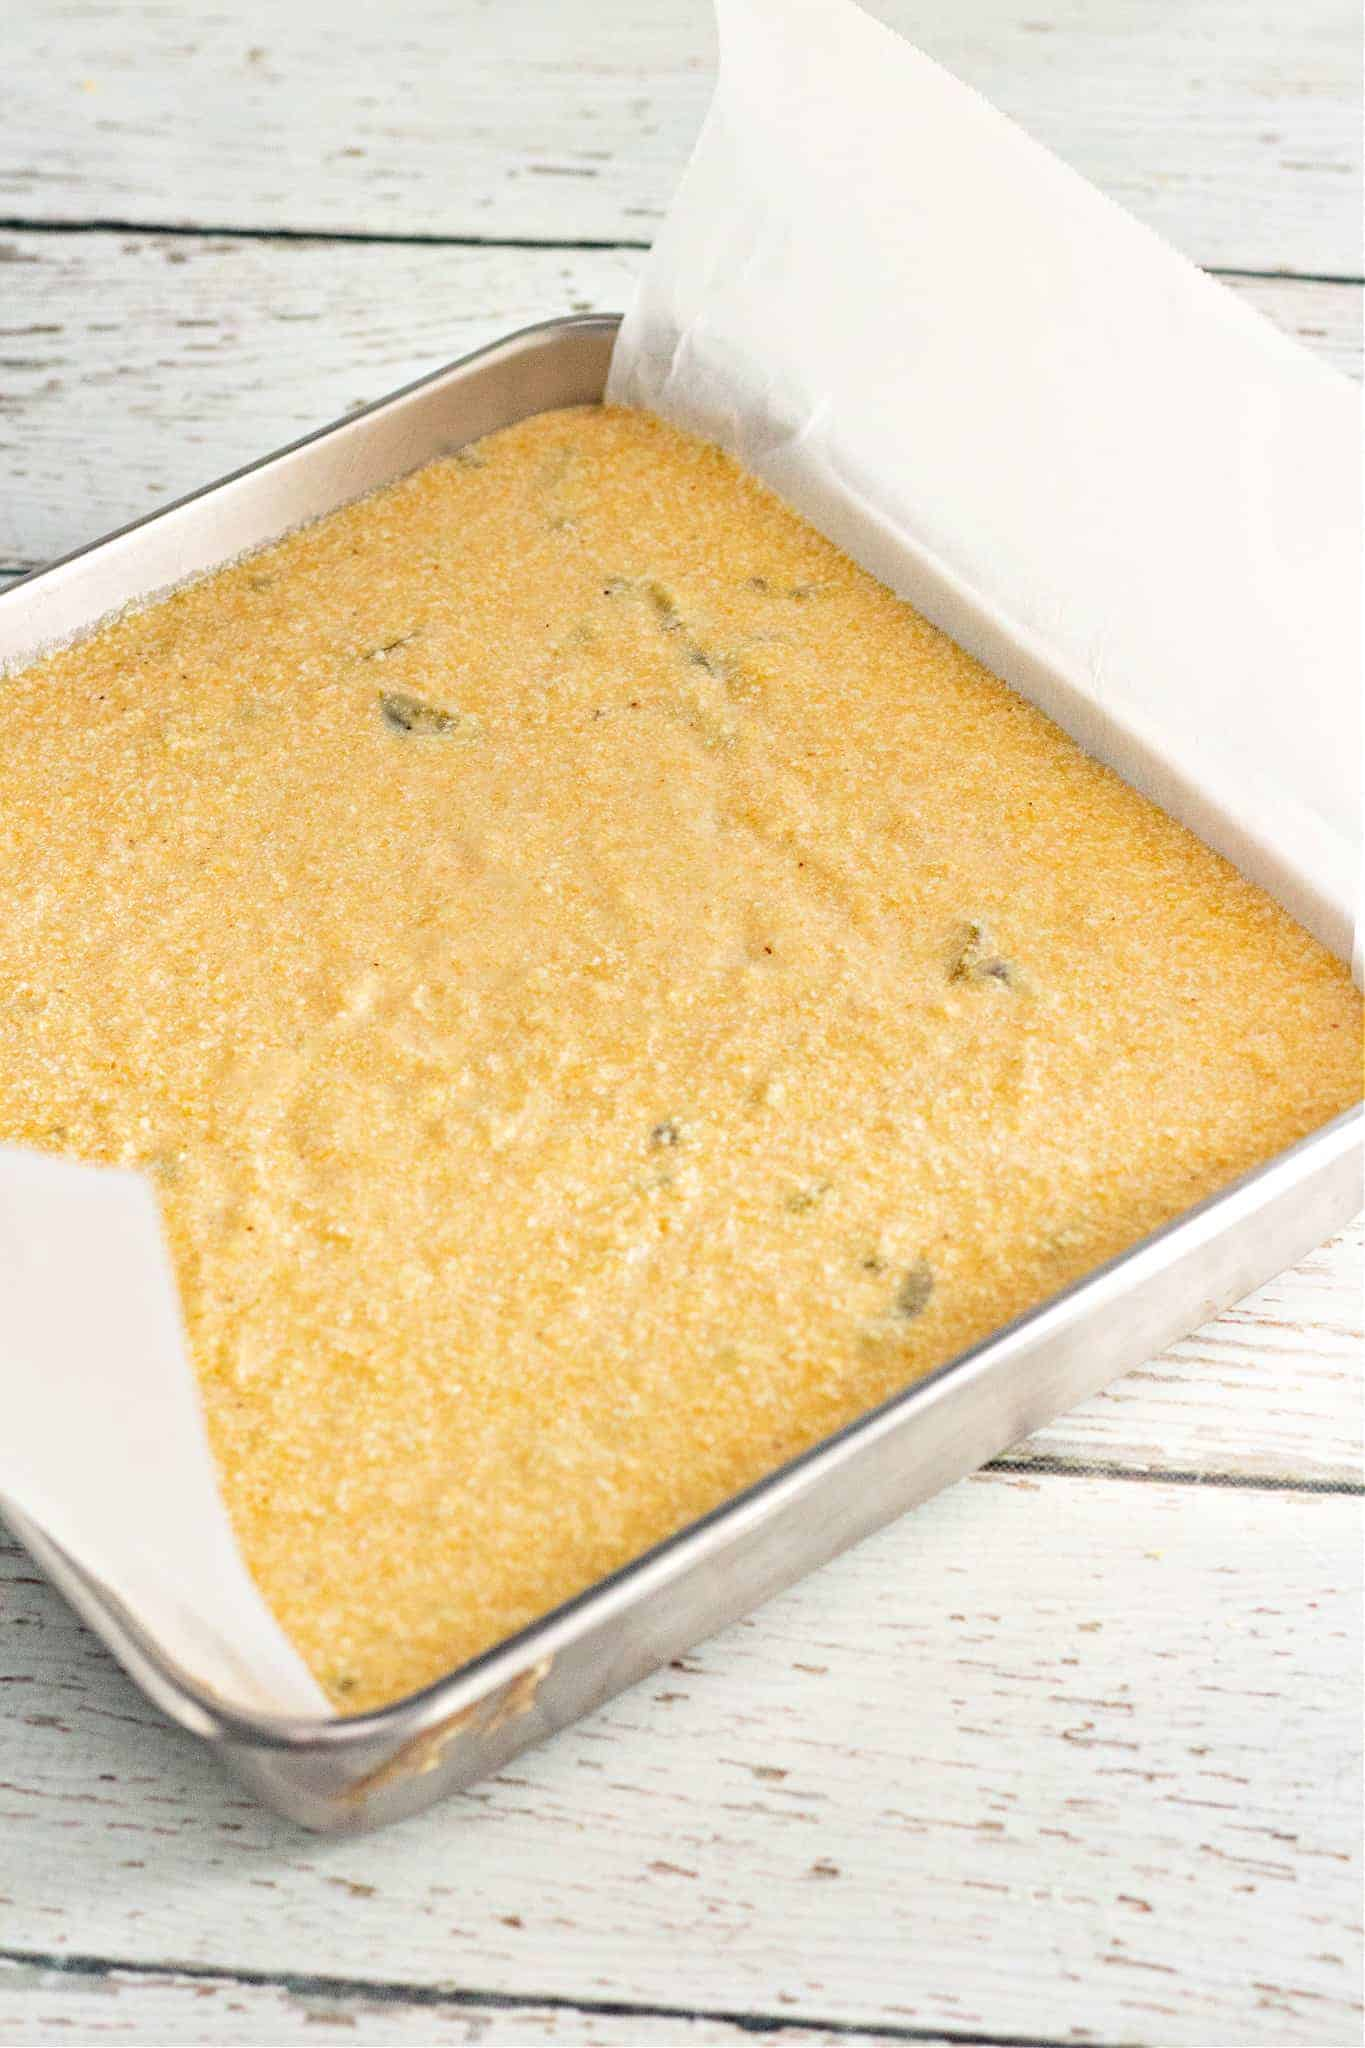 unbaked cornbread